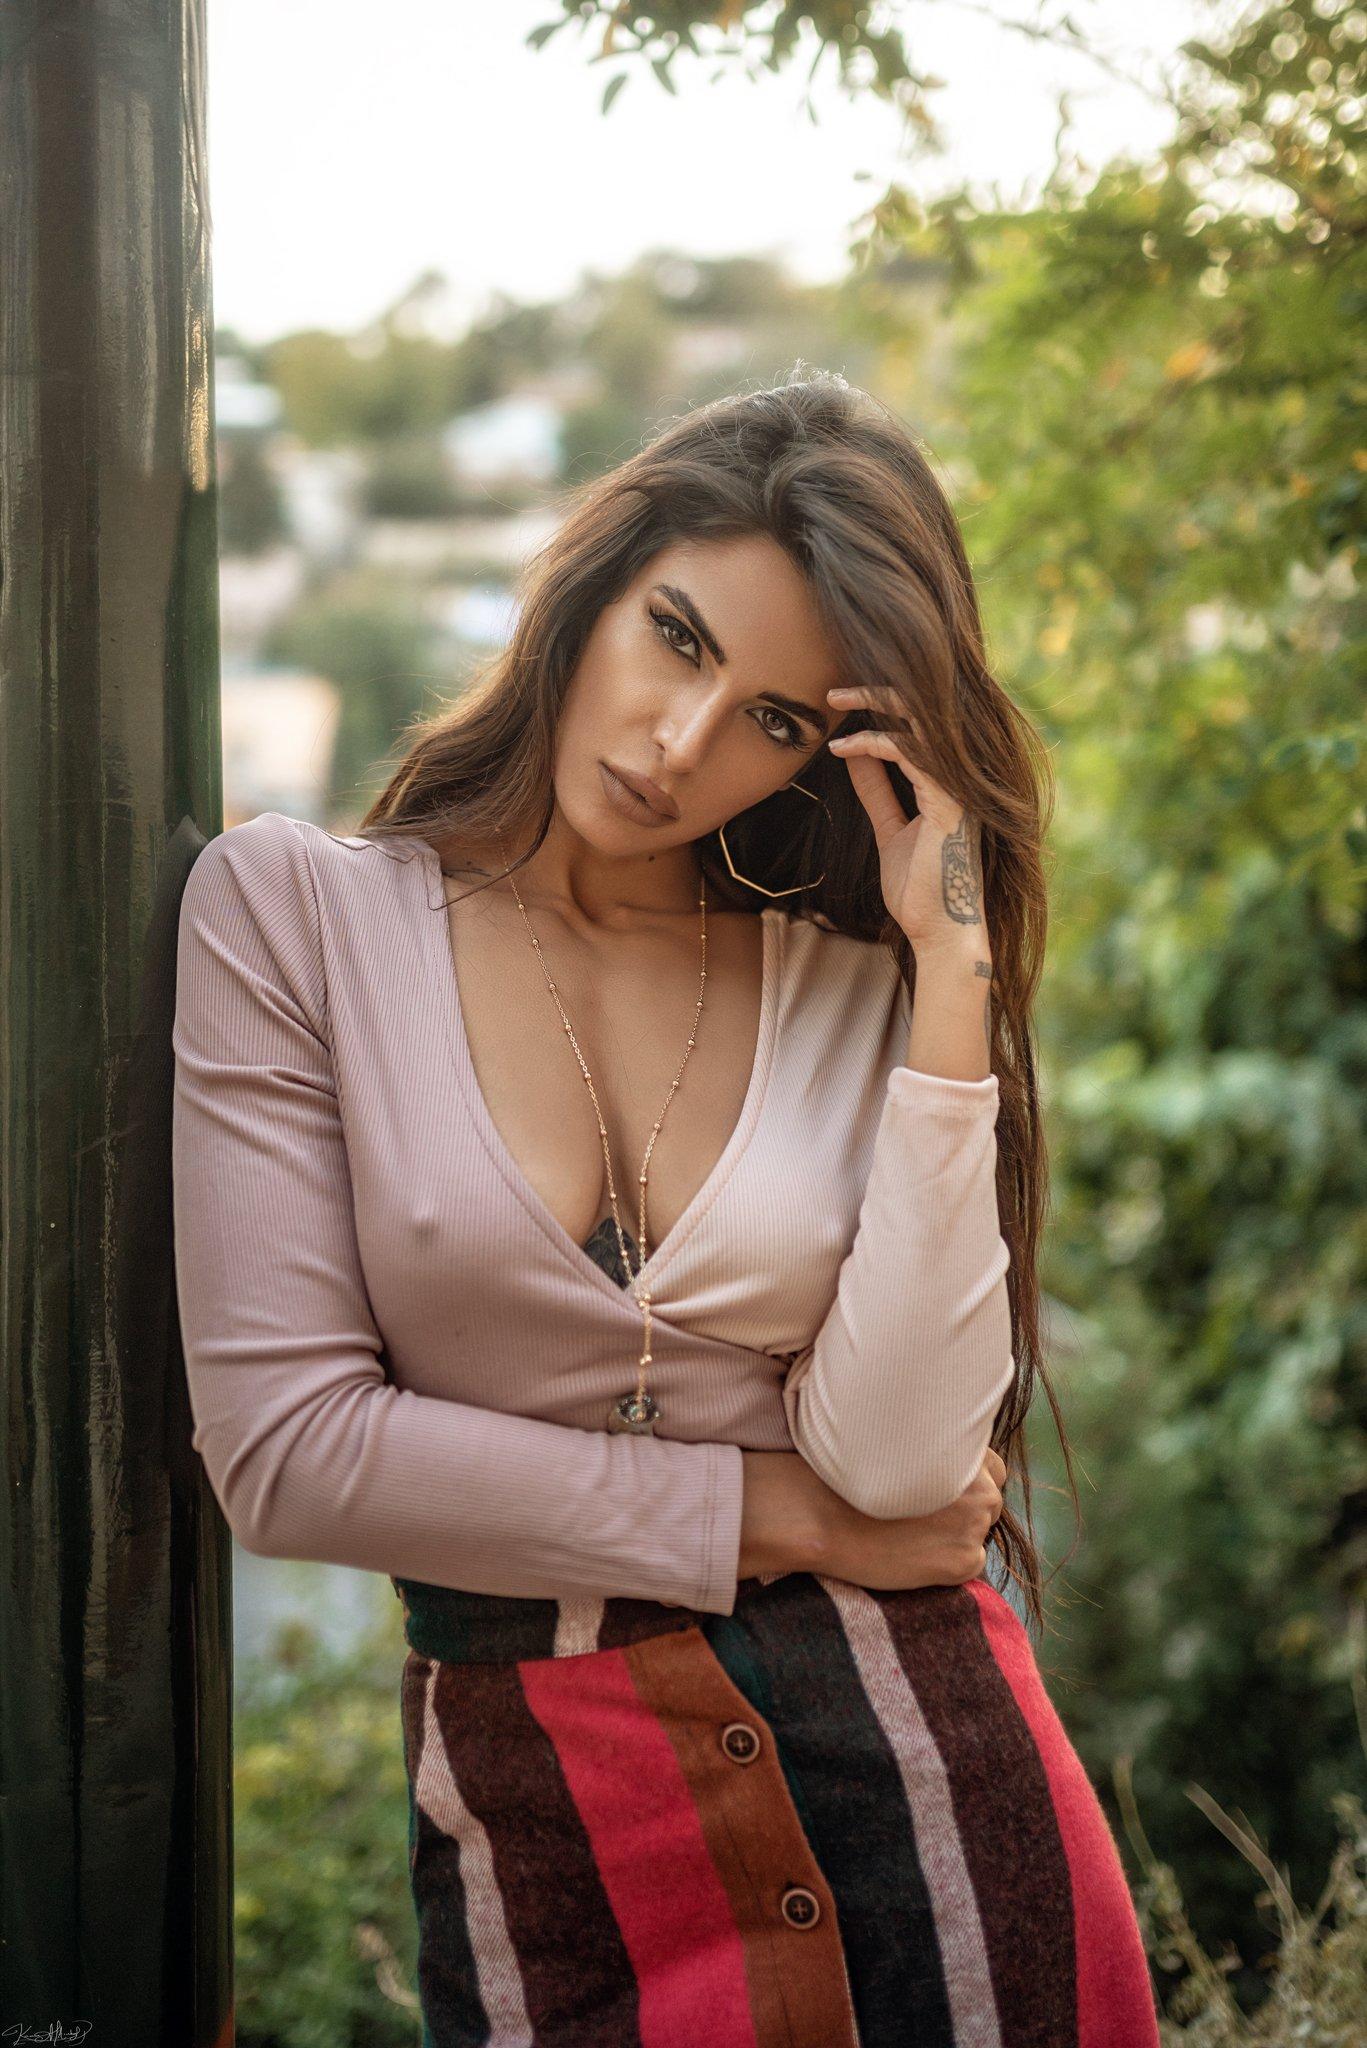 model, sexy, body, beauty, pretty, natural, light, beautiful, fashion, face, eyes, sweet, nature, urban, portrait, art, istanbul, Каан Алтындал